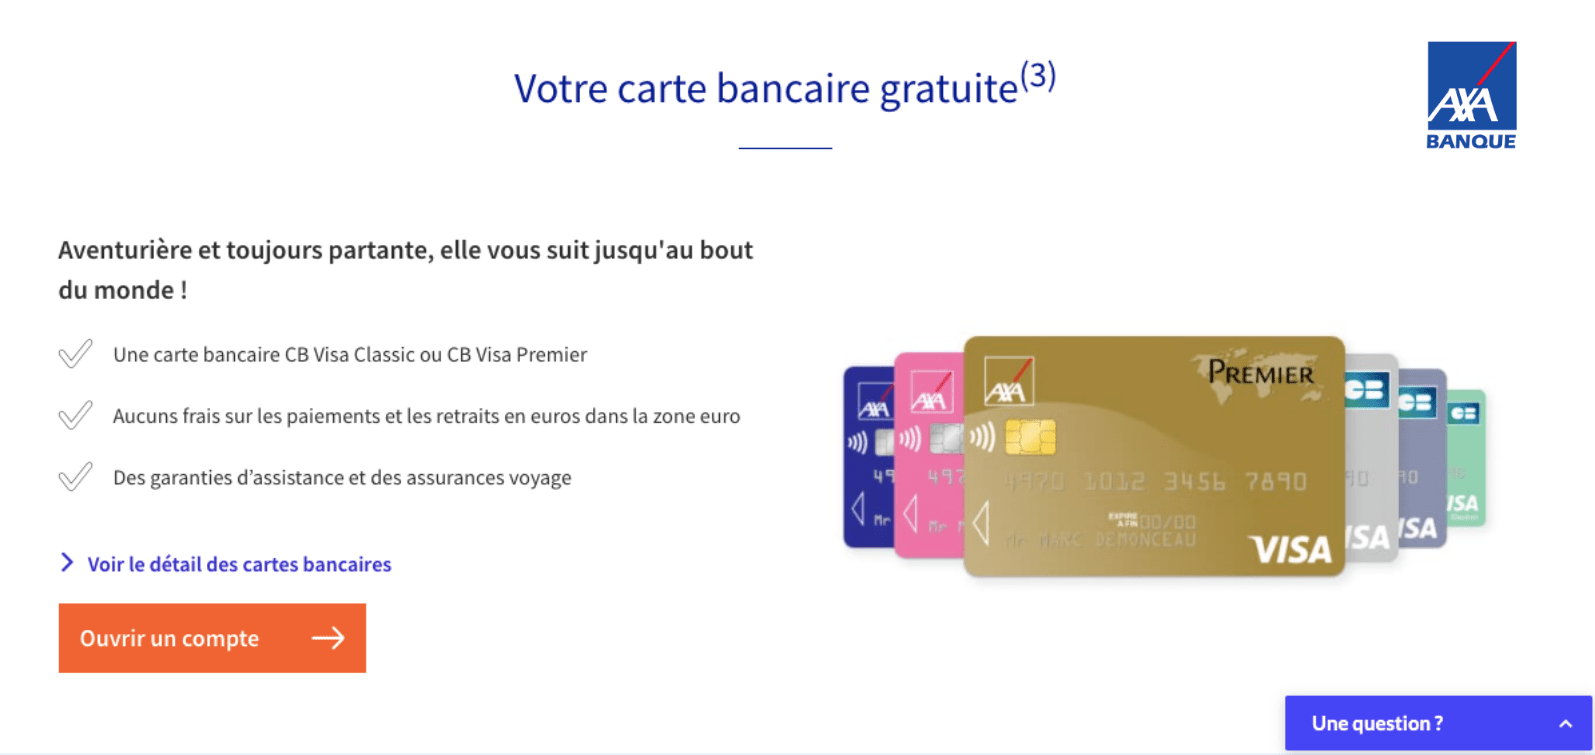 Ouvrir un compte Axa Banque en ligne rapidement